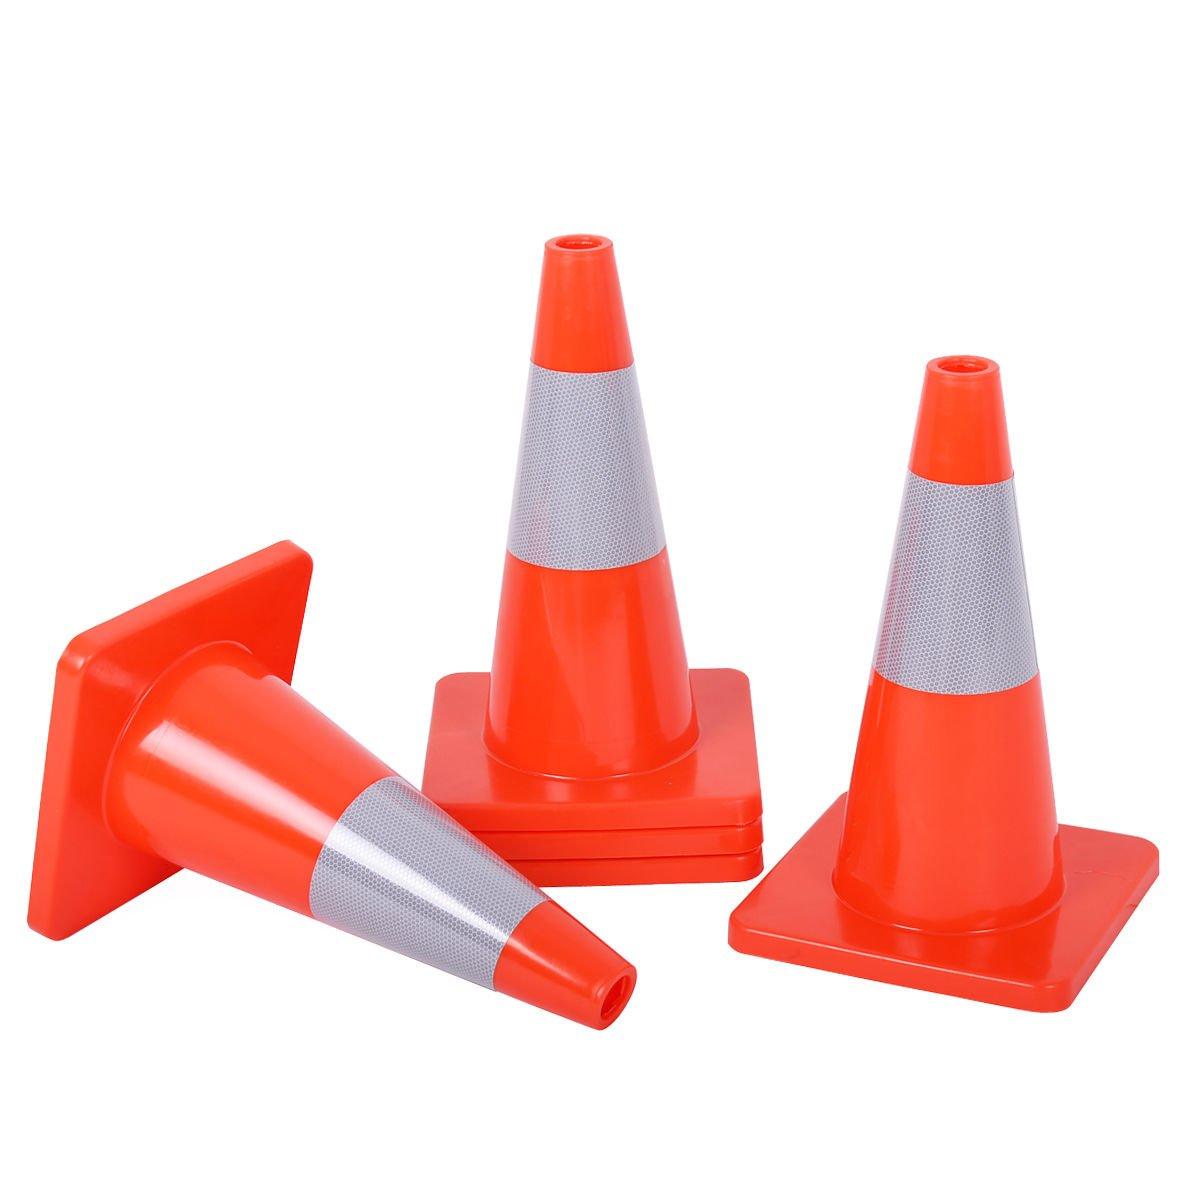 Buy Goplus 5pcs Traffic Cones 18 Orange Slim Fluorescent Reflective